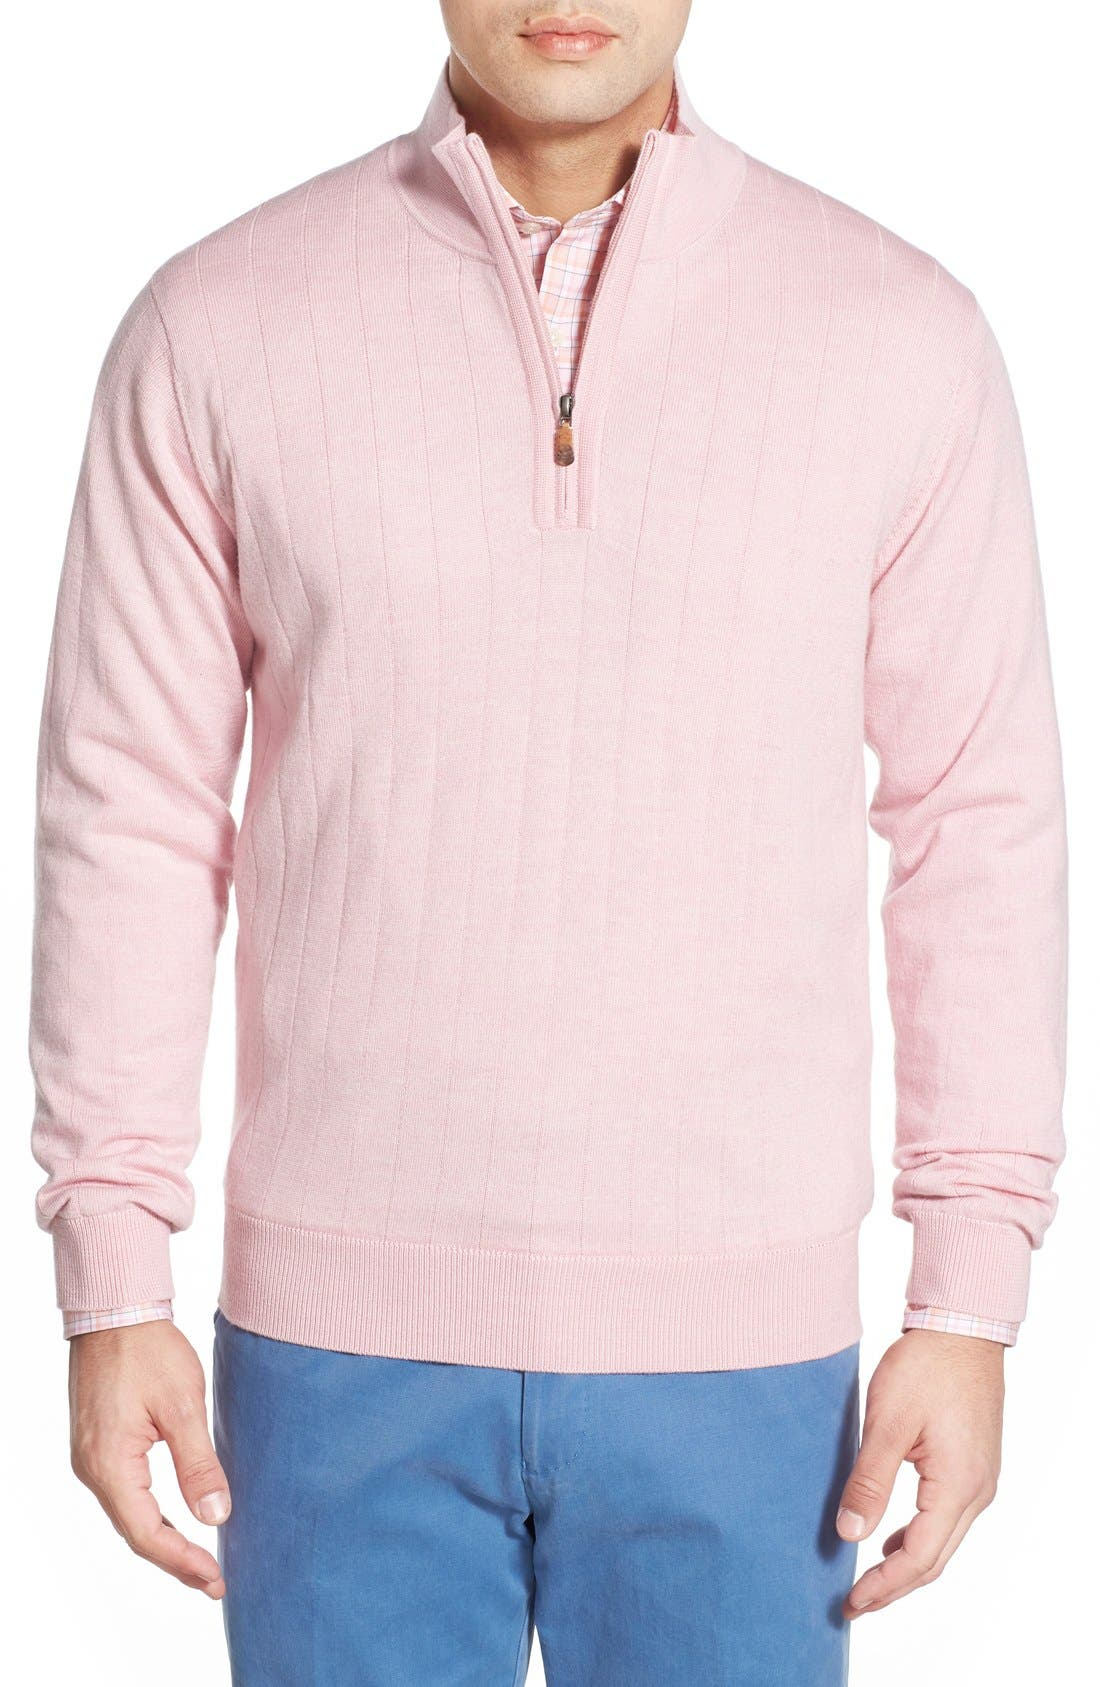 Windproof Merino Wool Quarter Zip Sweater,                             Main thumbnail 1, color,                             Pale Pink